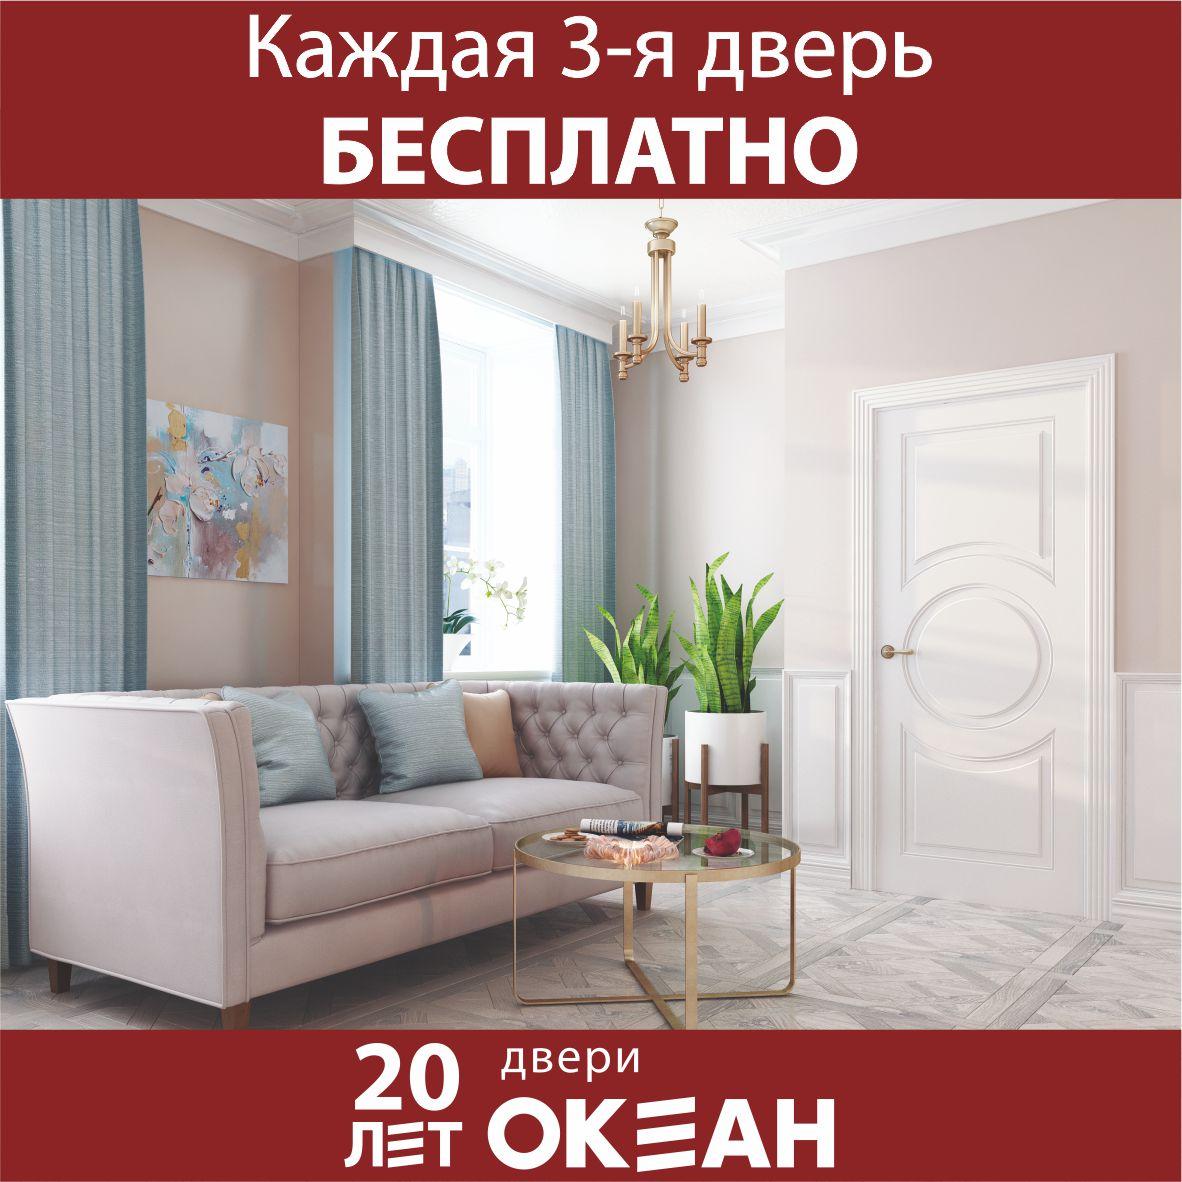 Ульяновские двери Океан ЛАЦИО со скидками и подарками фото картинки